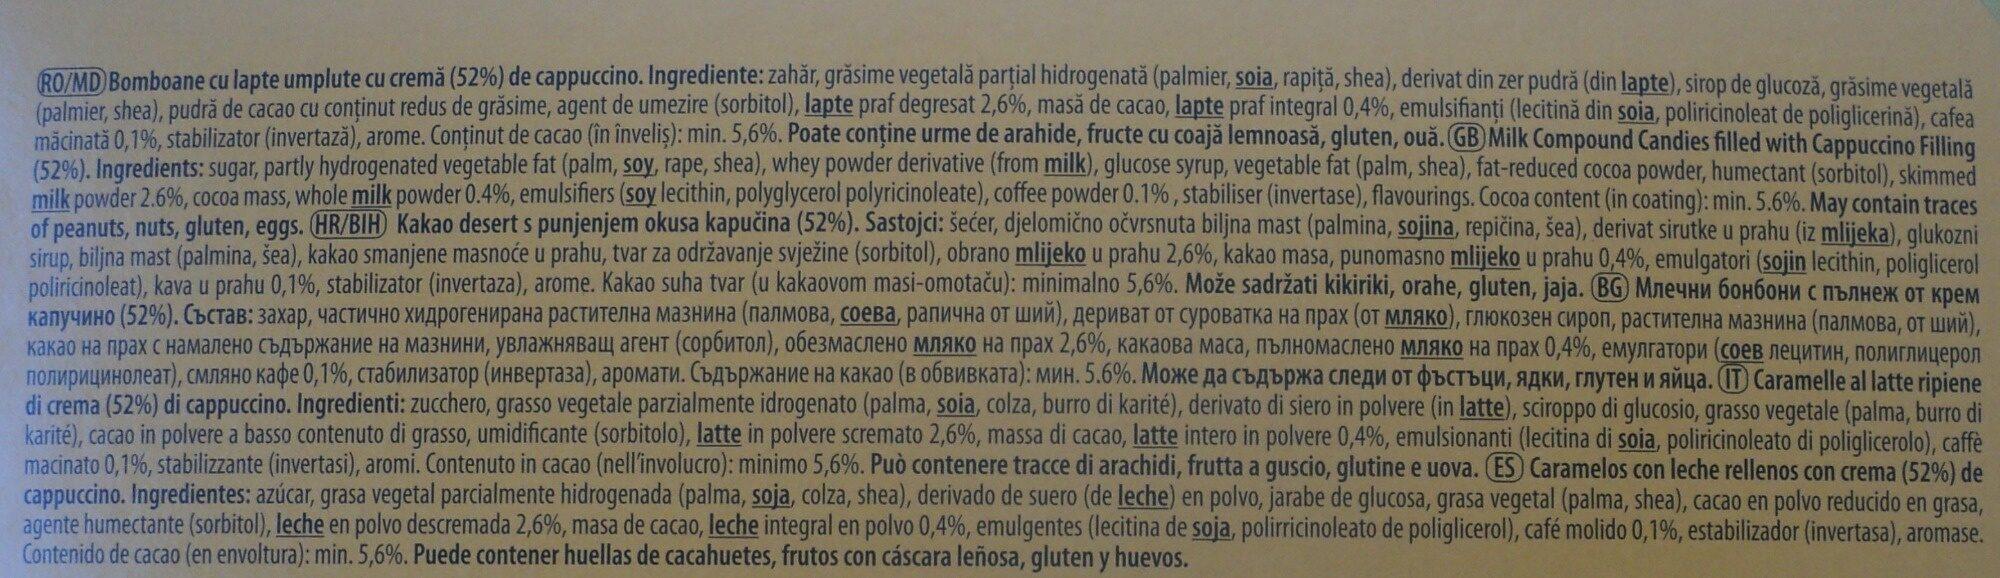 Bomboane cu cremă cappuccino - Ingredients